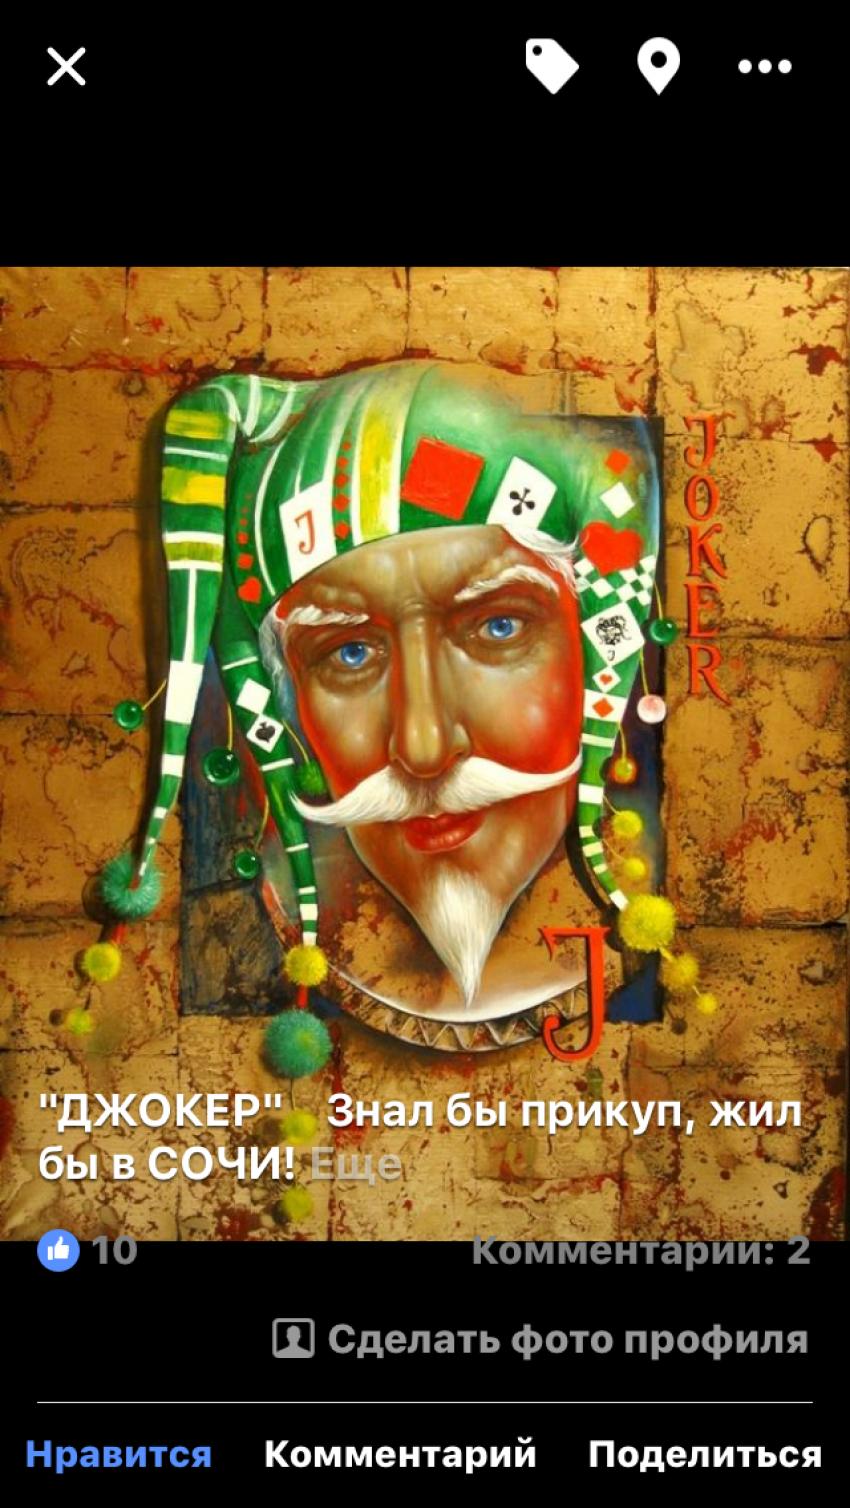 Yury Krasavin-Belopolsky. Joker - photo 1